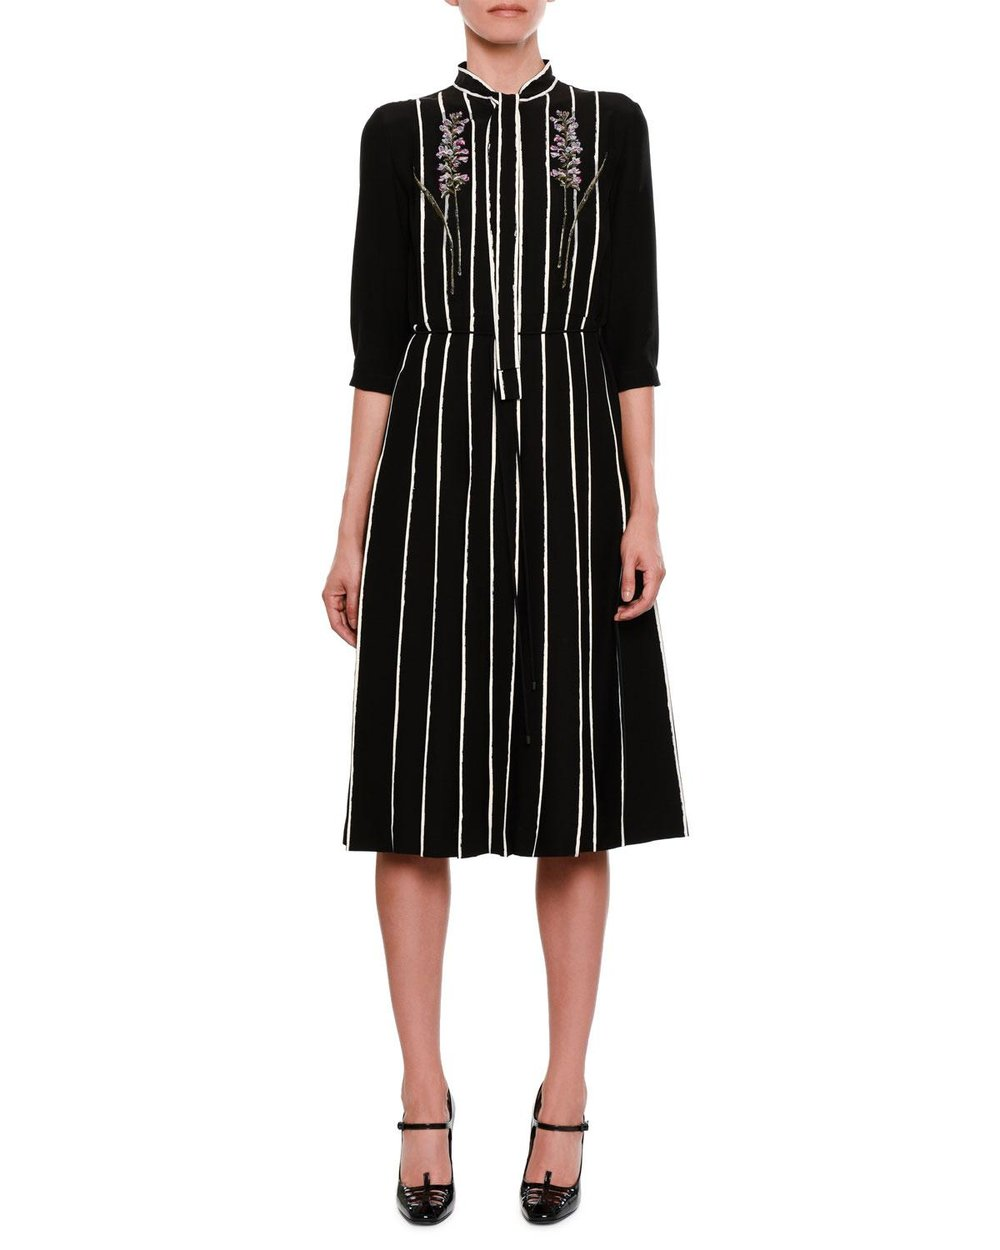 bottega-veneta-BLACKWHITE-Striped-Floral-embroidered-Tie-neck-Dress.jpeg